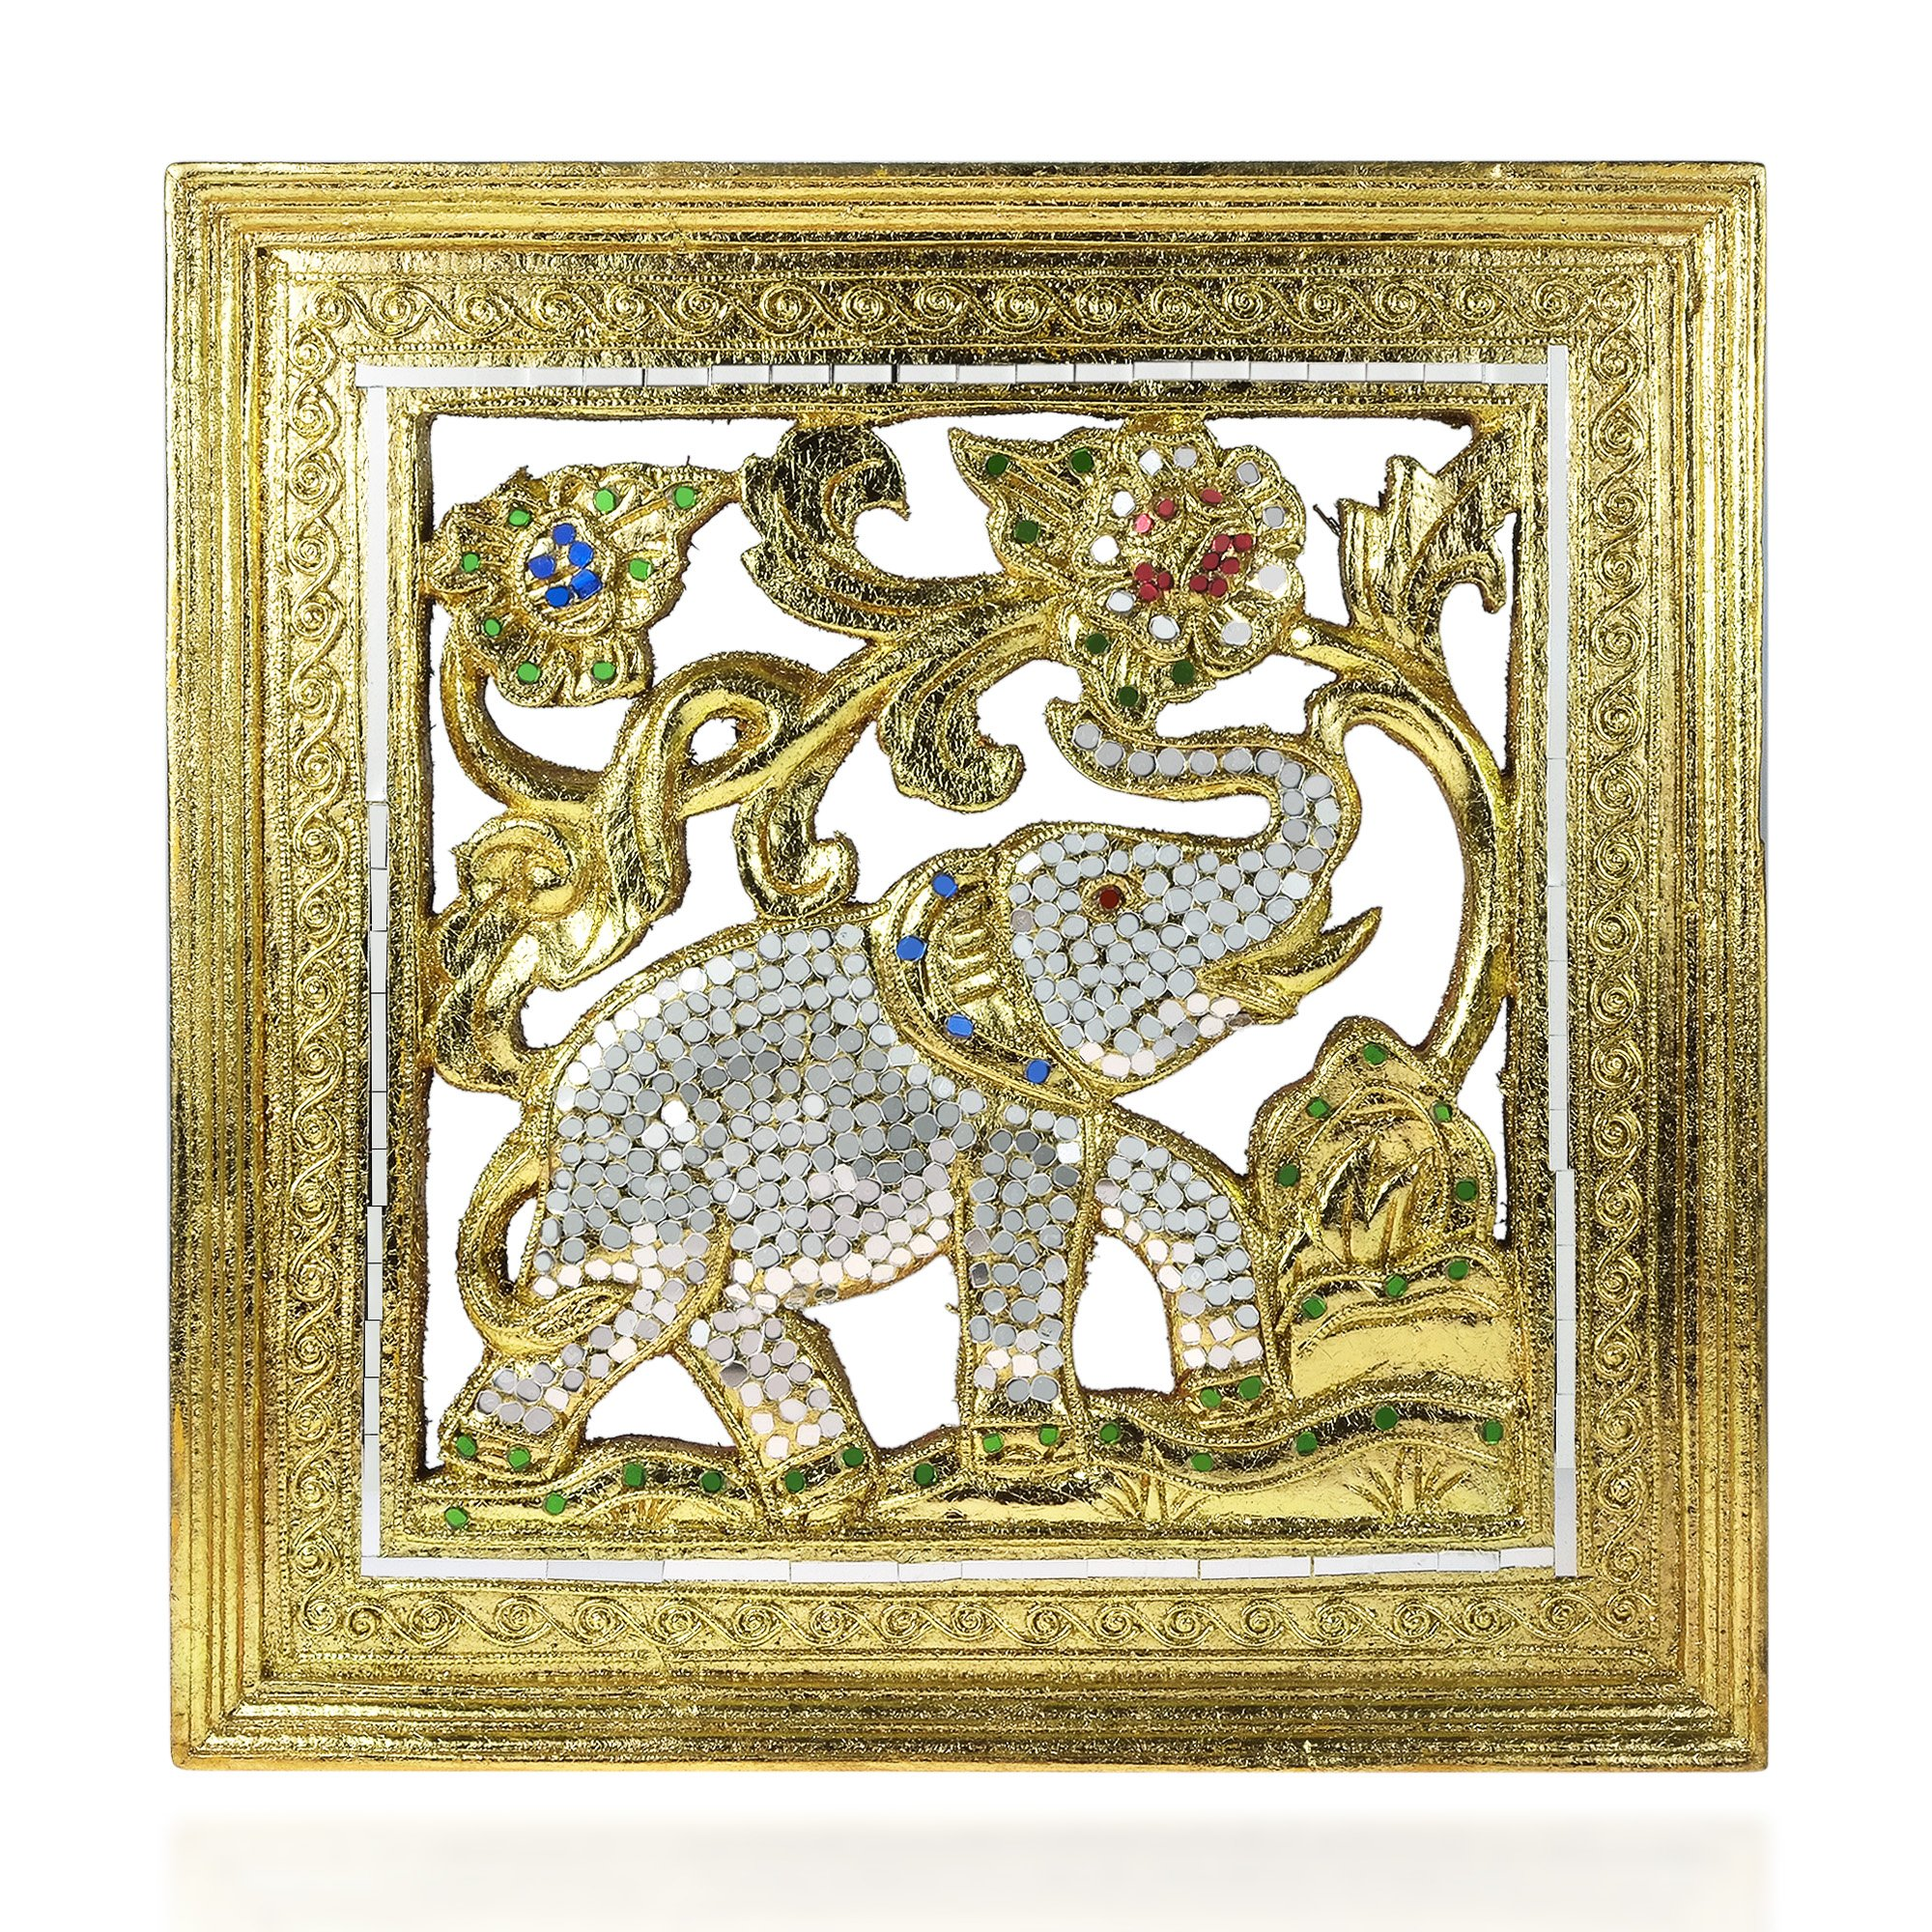 Elephant Jubilee Gilded 24k Gold-Tone Leaf Mosaic Mirror Carved Rain Tree Wood Frame - Fair Trade Handicraft by Thai Artisans